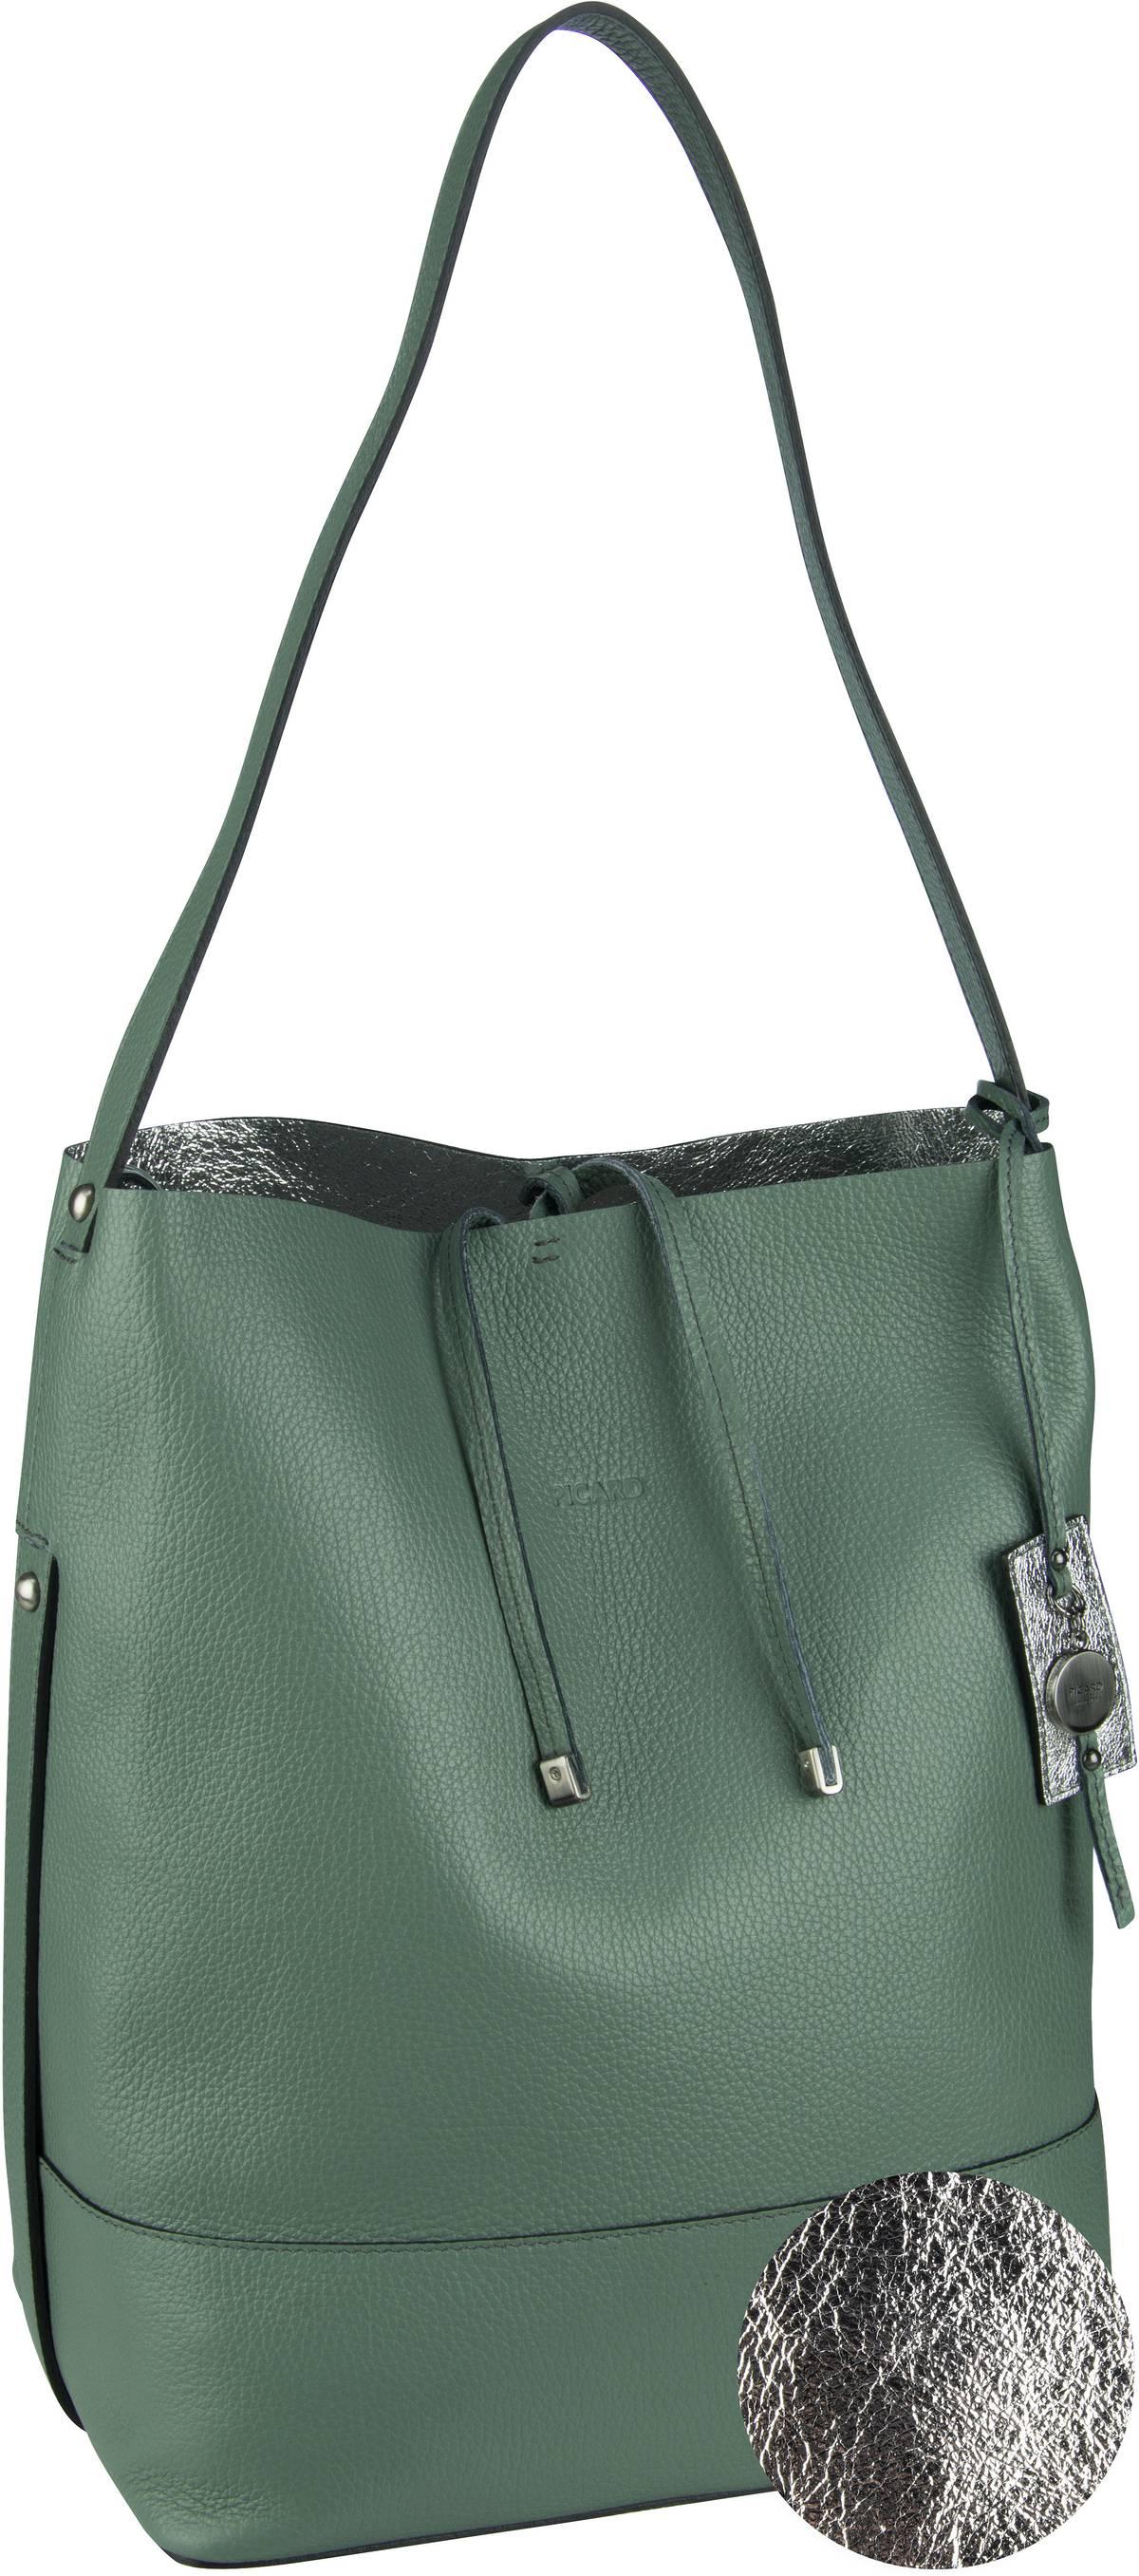 Handtasche Eclectic 4898 Salvia (innen: Silber)